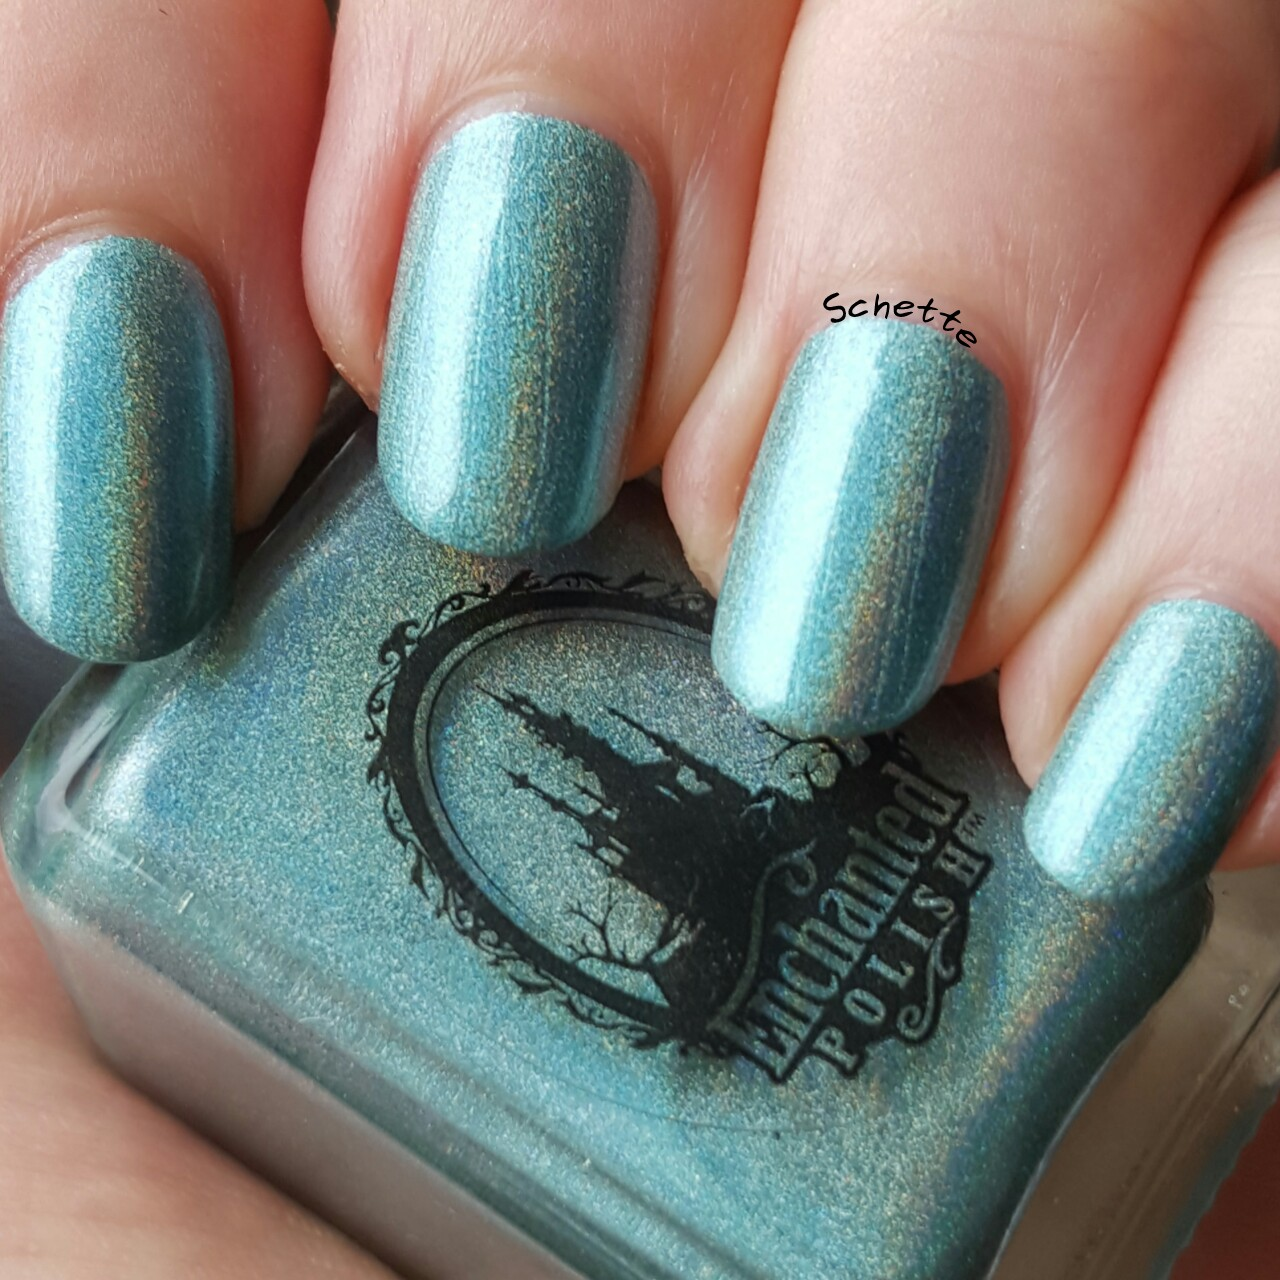 Enchanted Polish - Pegacorn